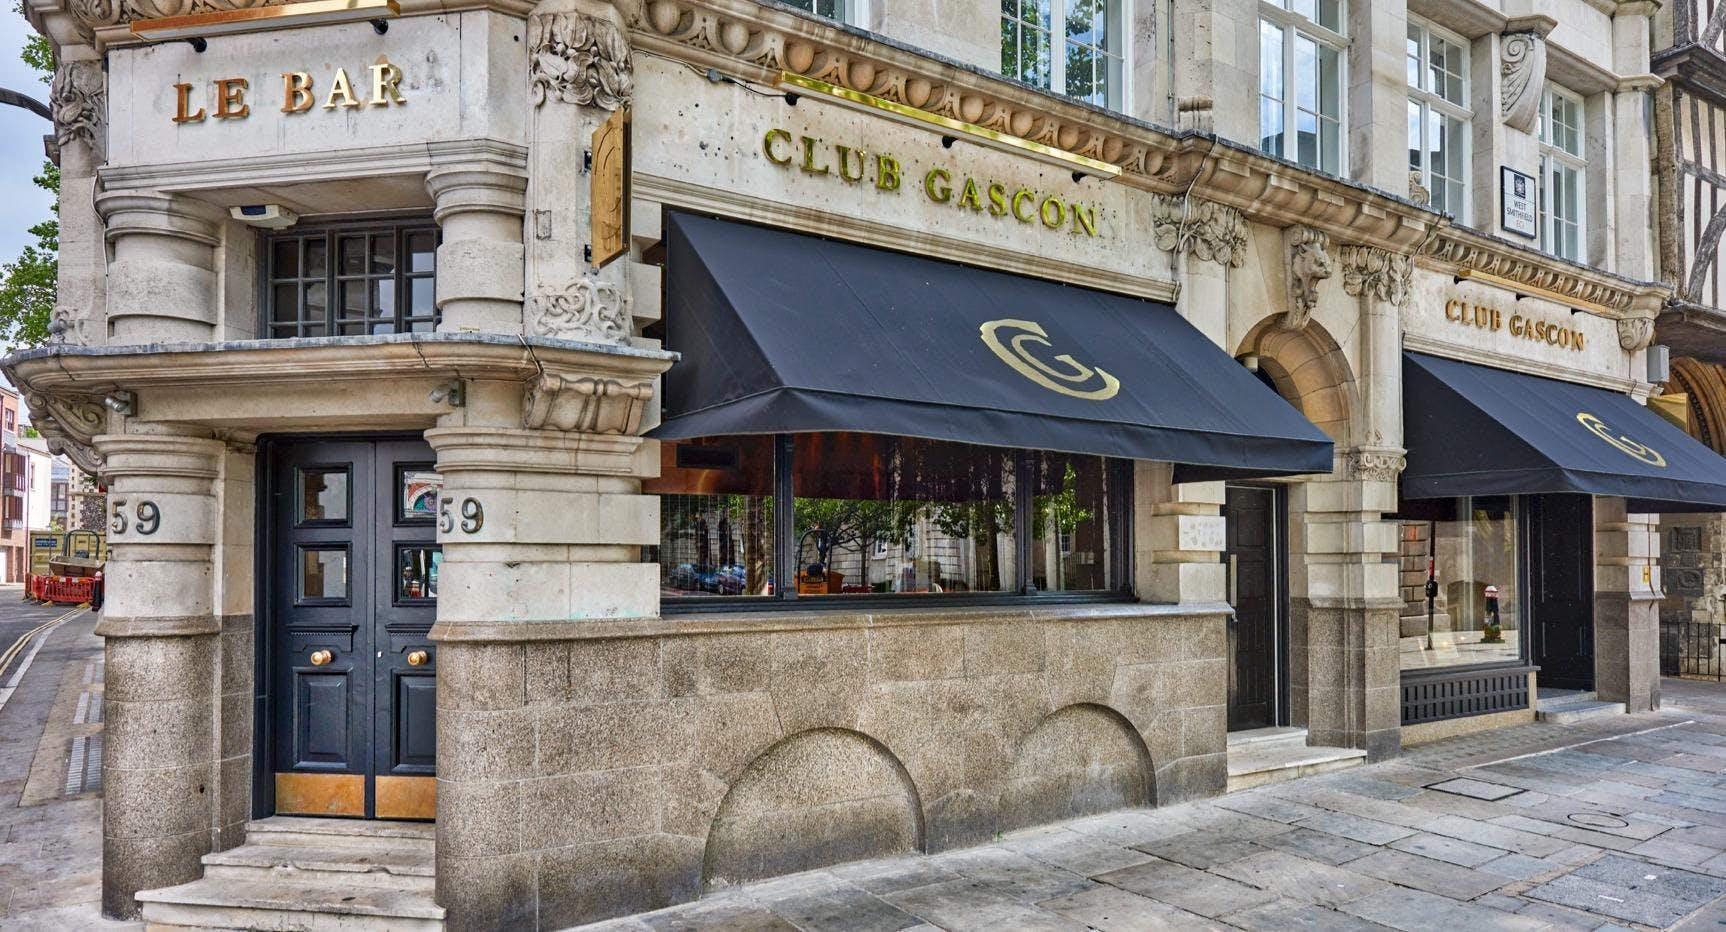 Club Gascon London image 1